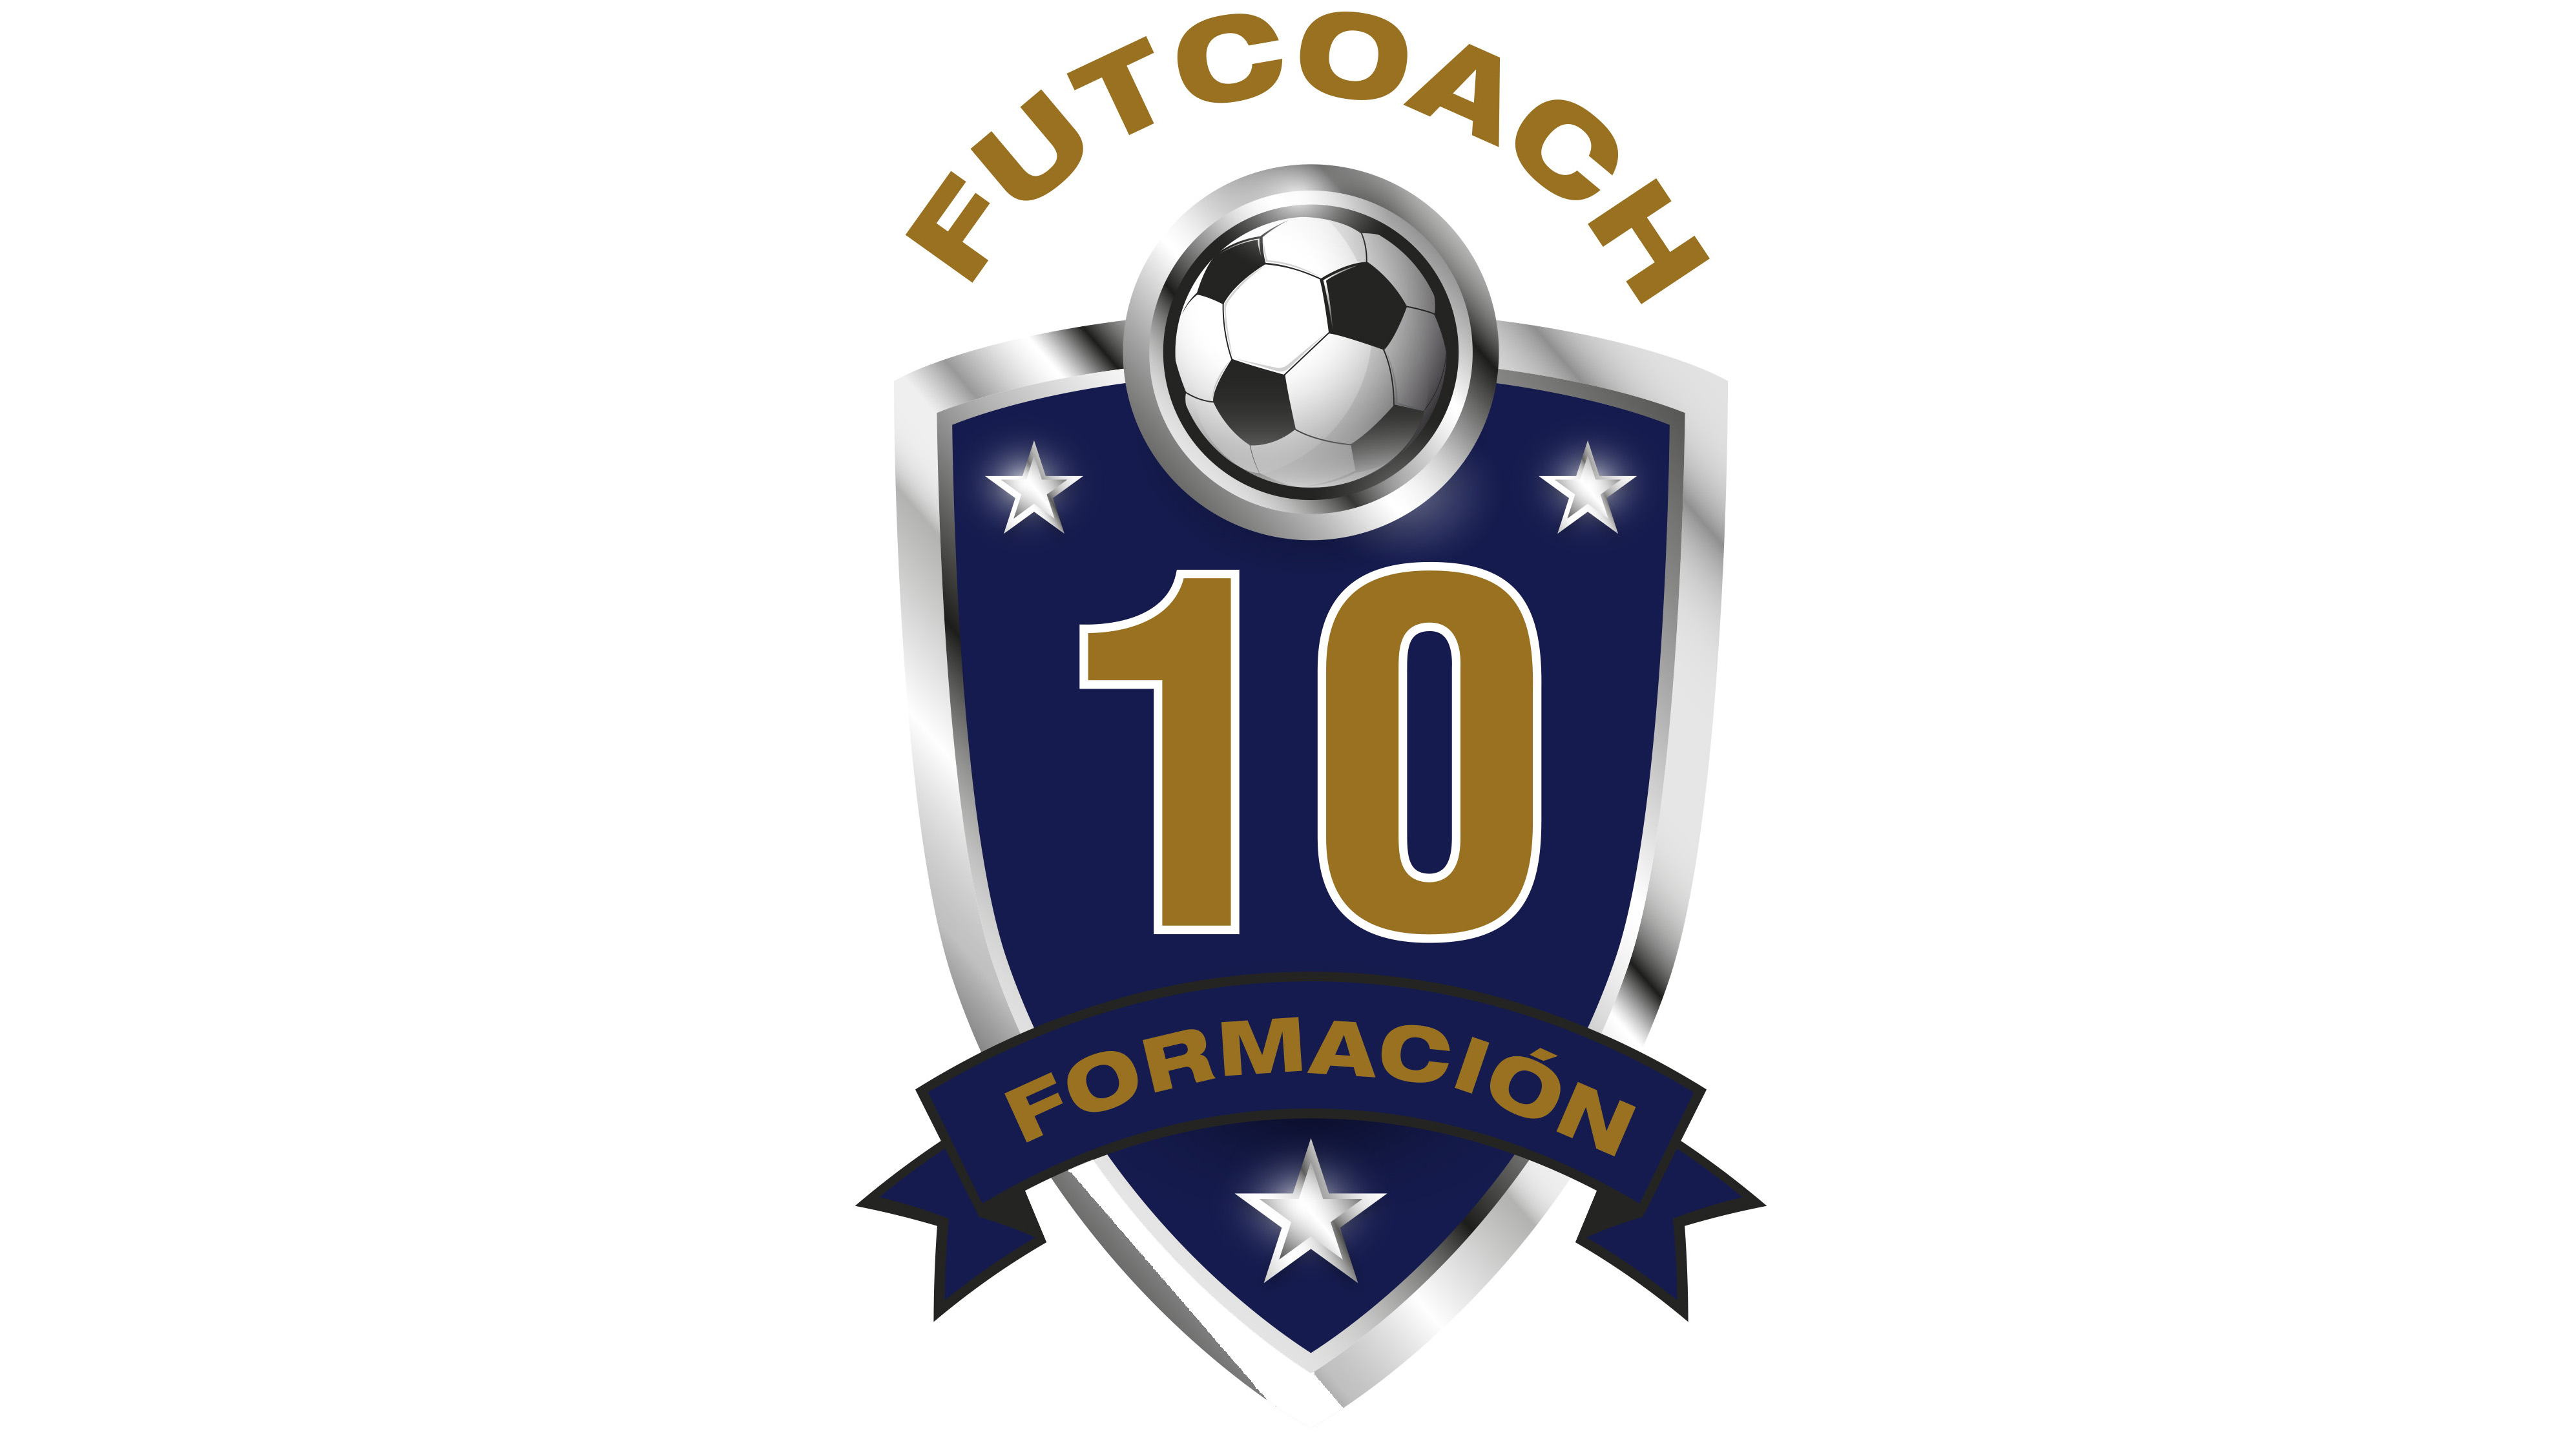 LOGO FUTCOACH_OK